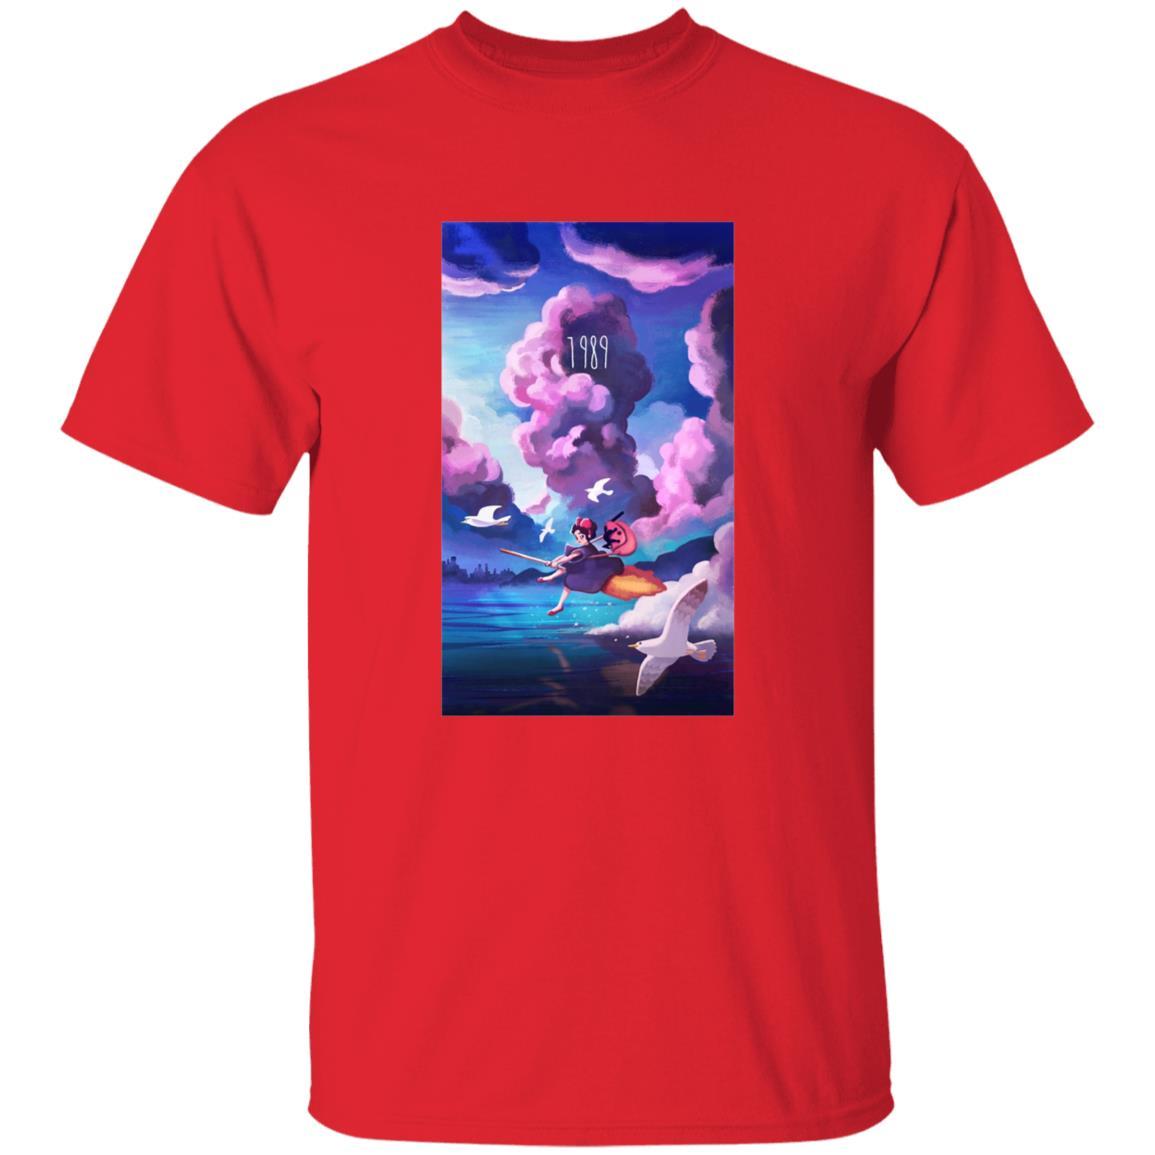 Kiki's Delivery service 1989 Illustration T Shirt